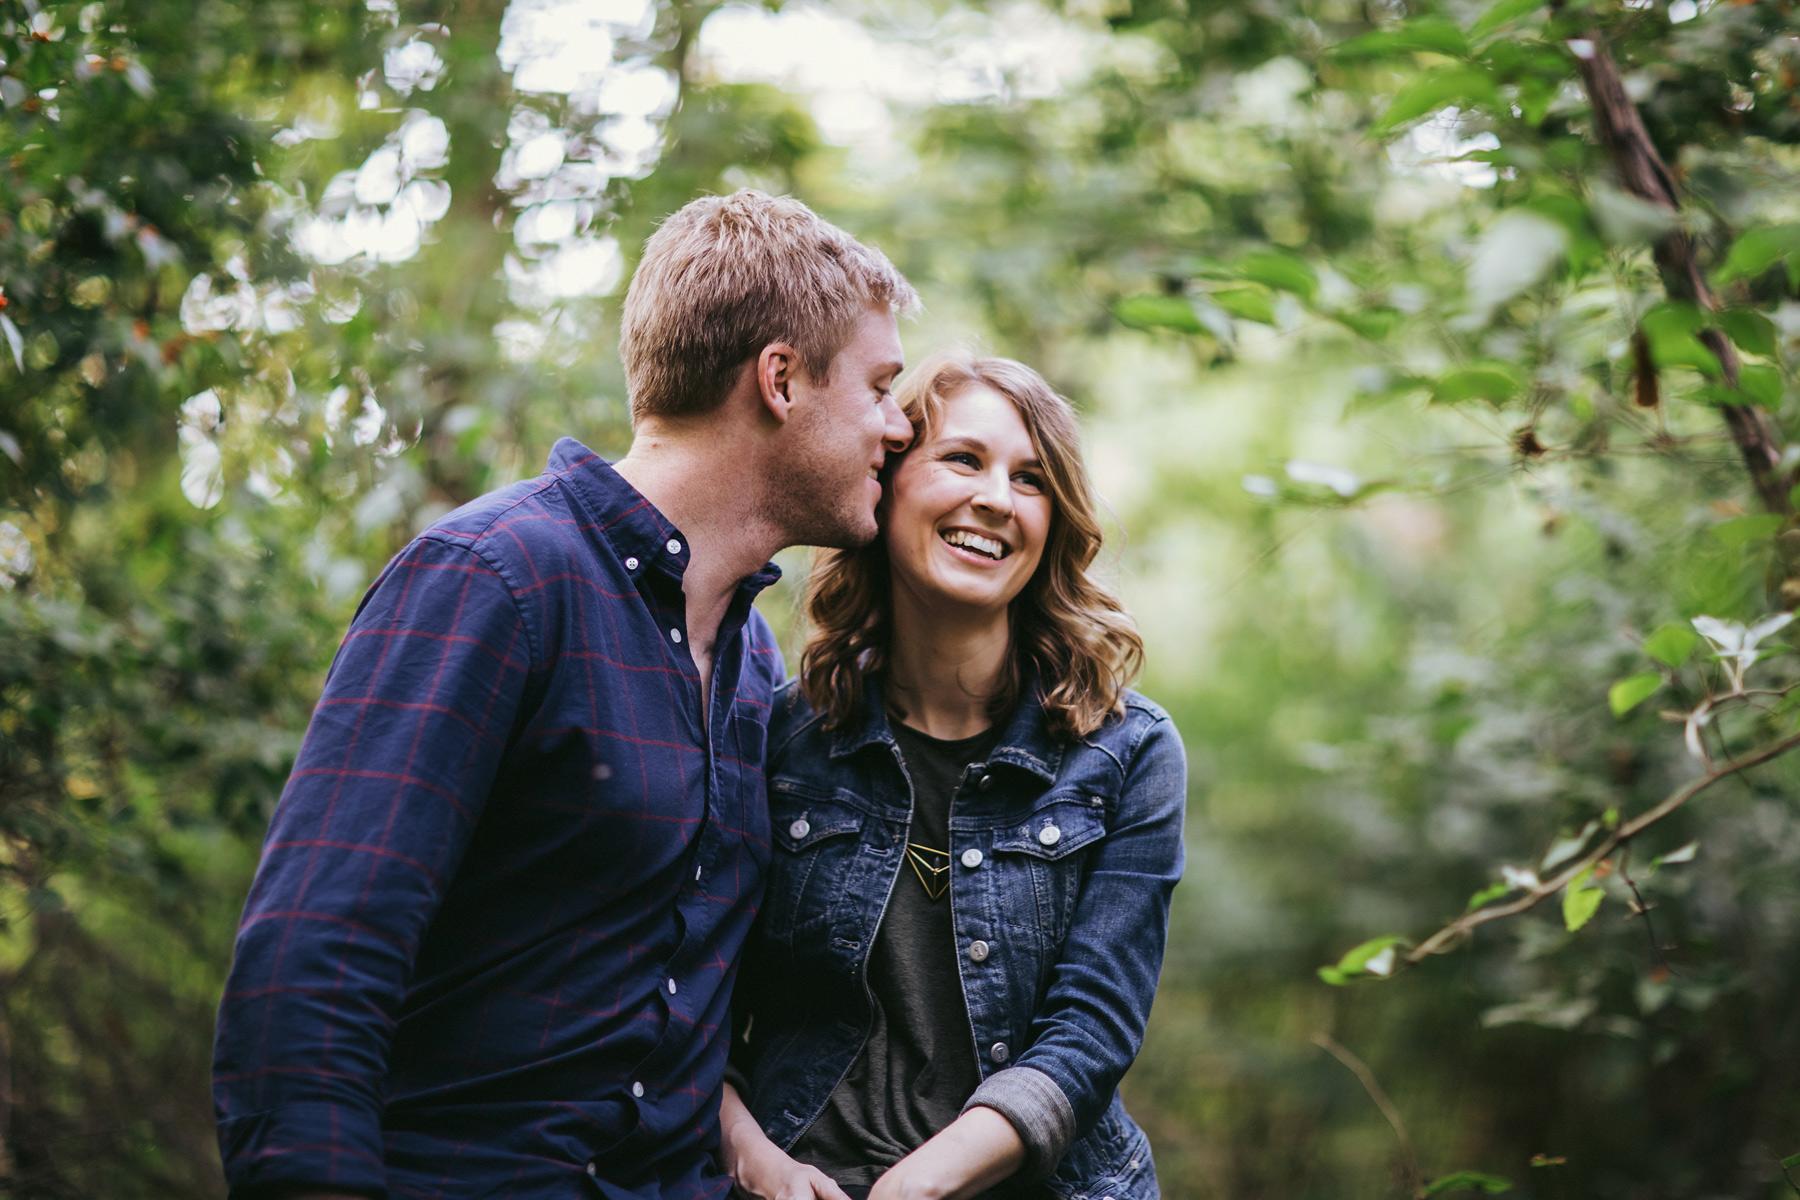 Capen Park Riverside Forest Engagement Photos_Kindling Wedding Photography Blog15.JPG